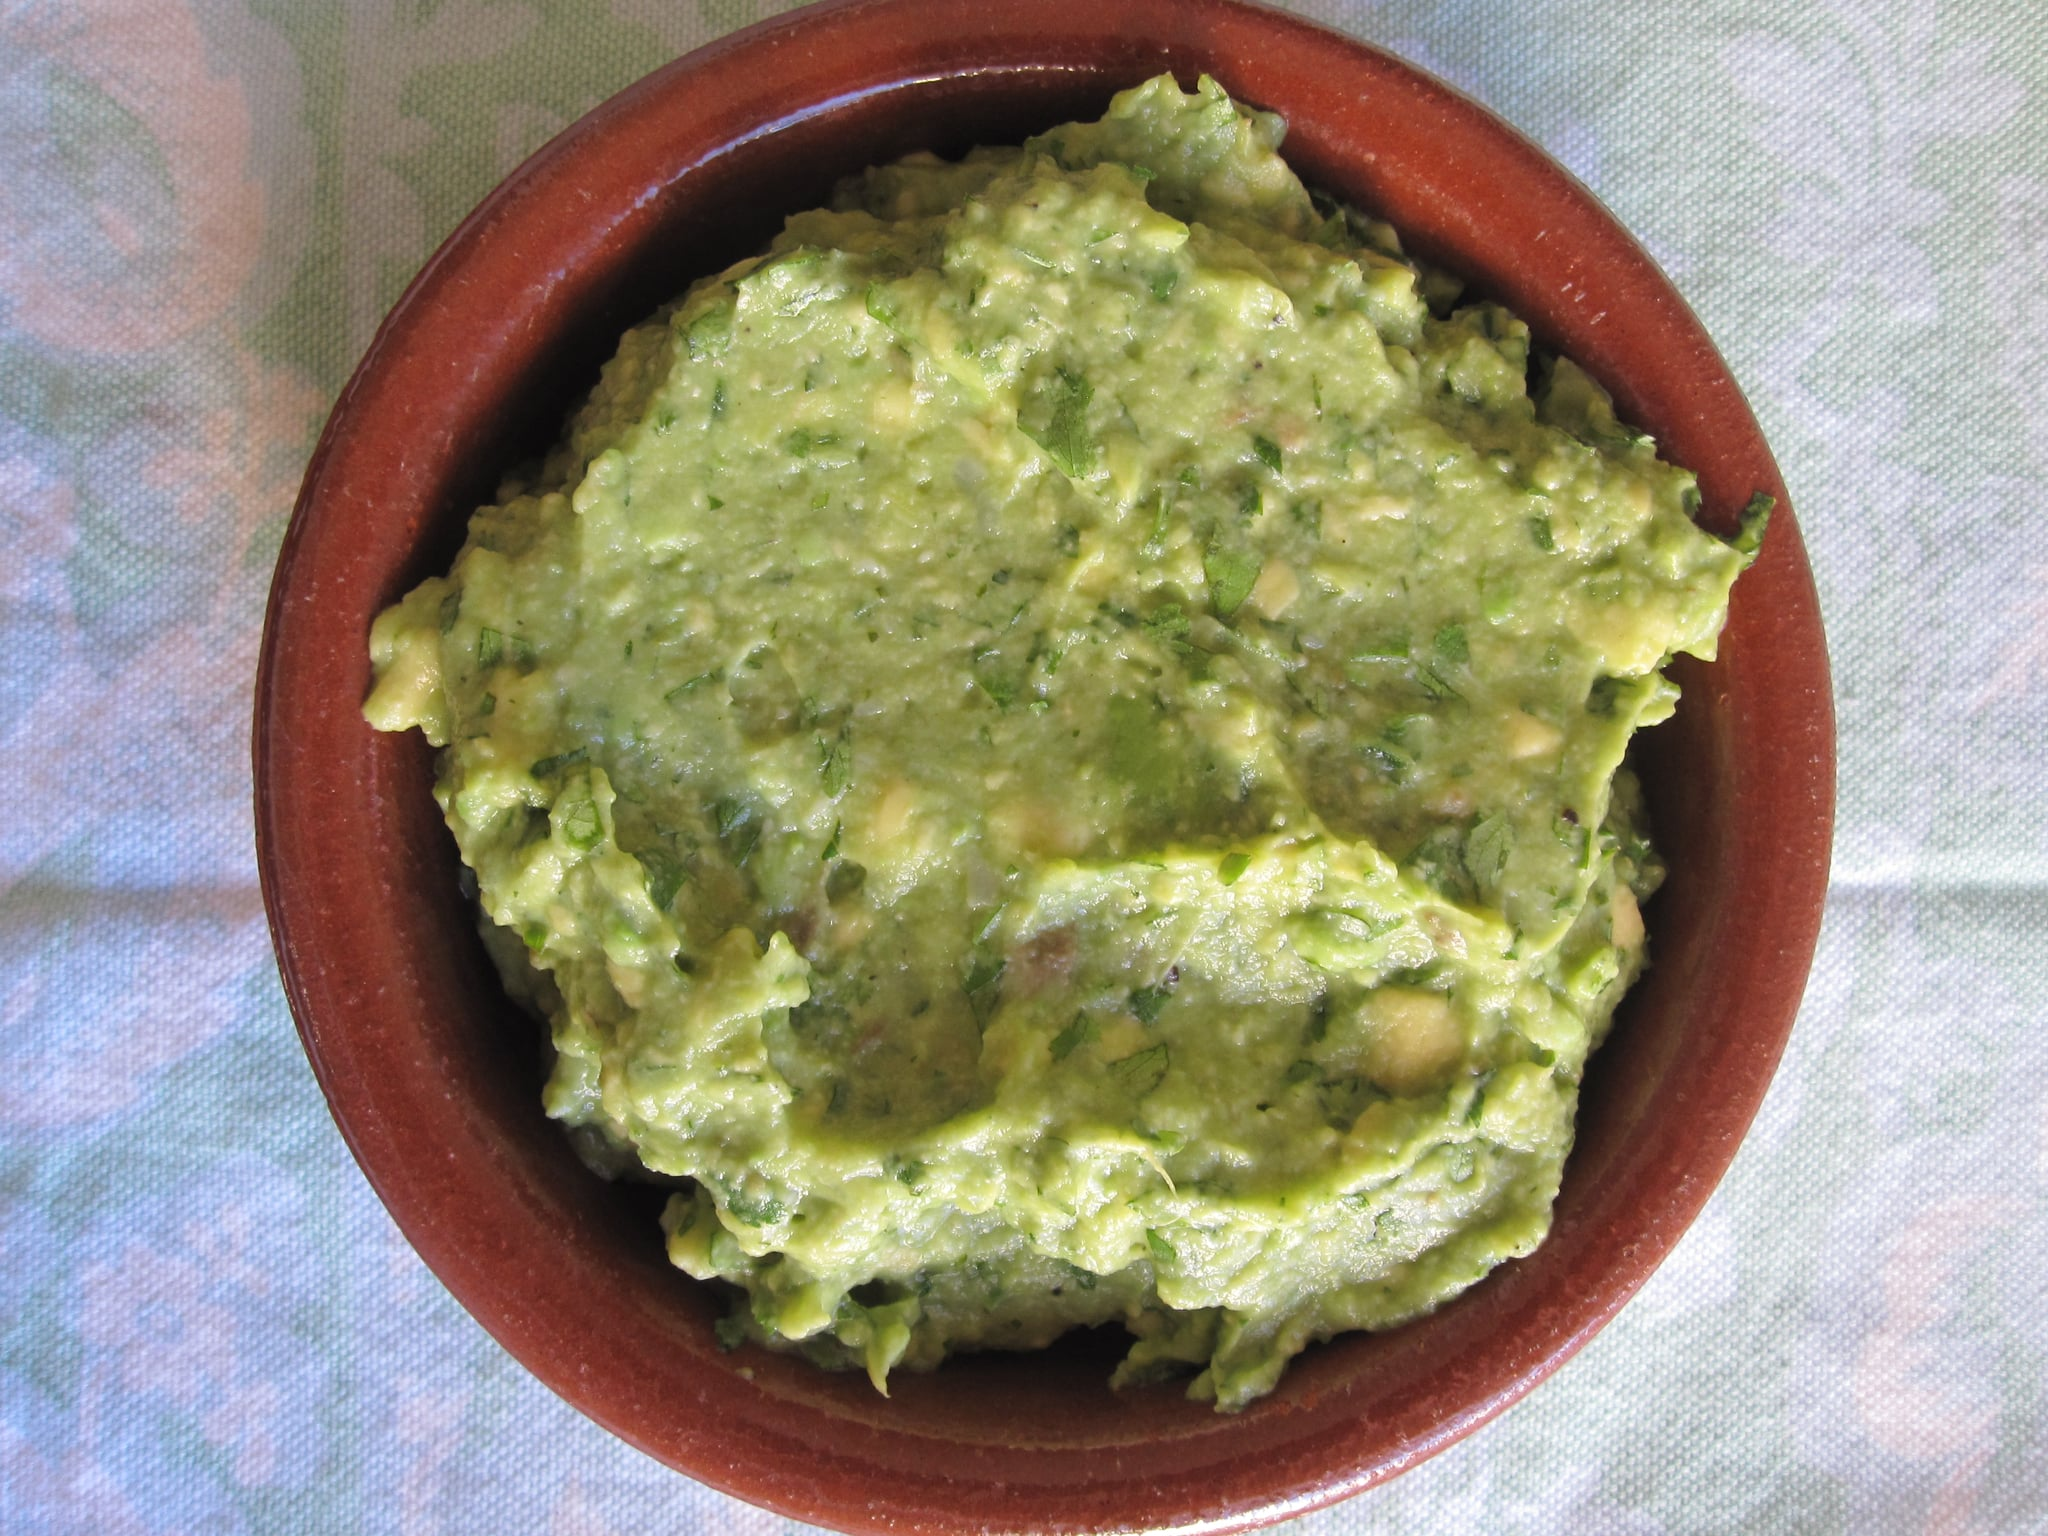 Roasted Garlic Guacamole | Mouthwatering Guacamole Recipes That'll ...